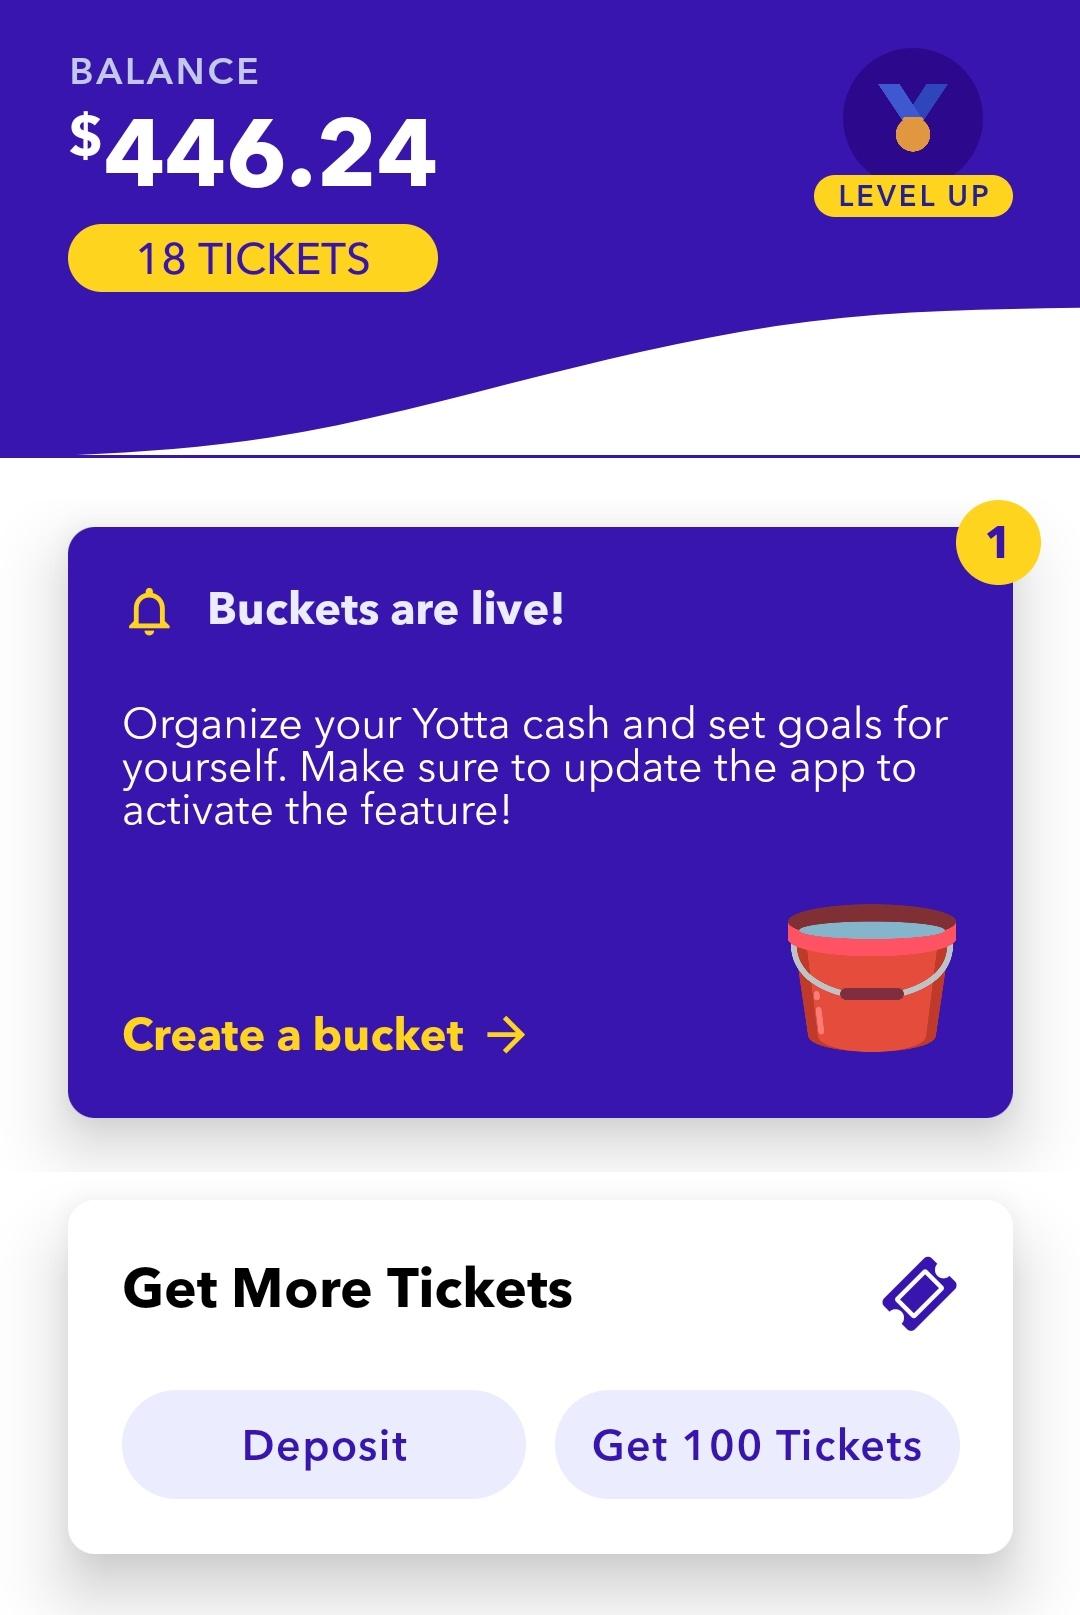 Use Code DIVI to get free tickets - My April 2021 end Yotta Savings balance thus far!